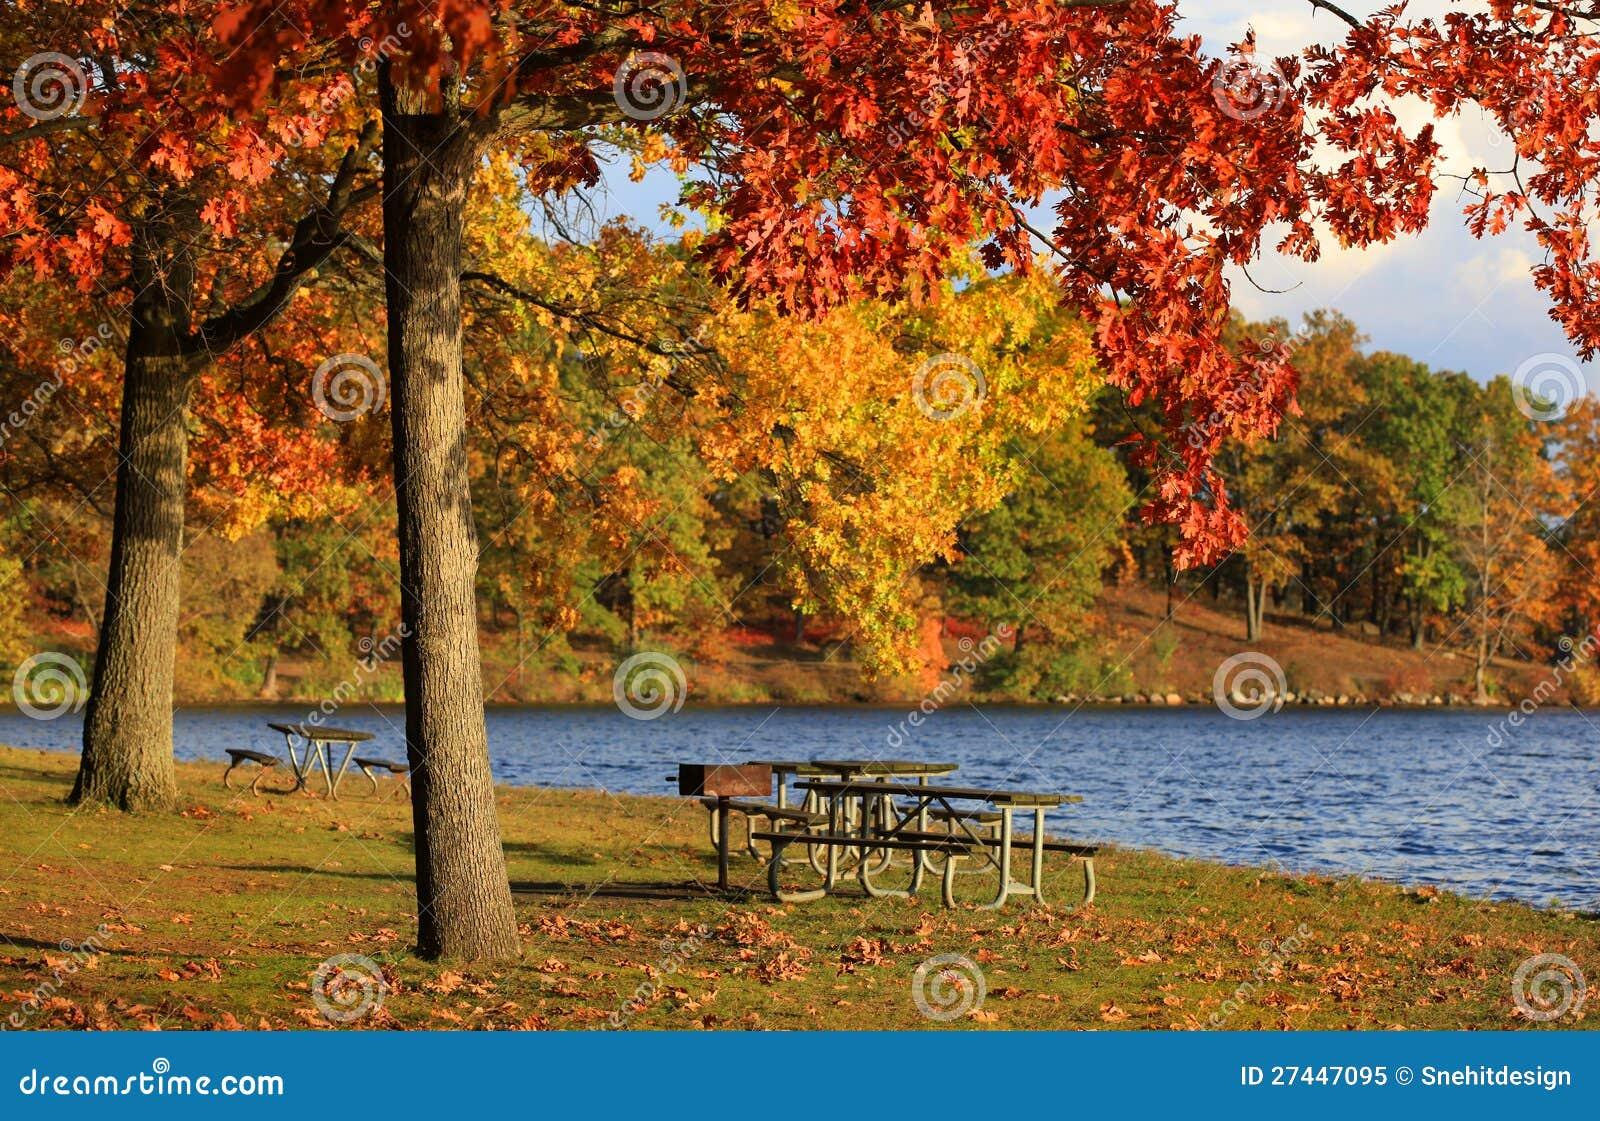 Autumn in kensington park royalty free stock photo image for Kensington park